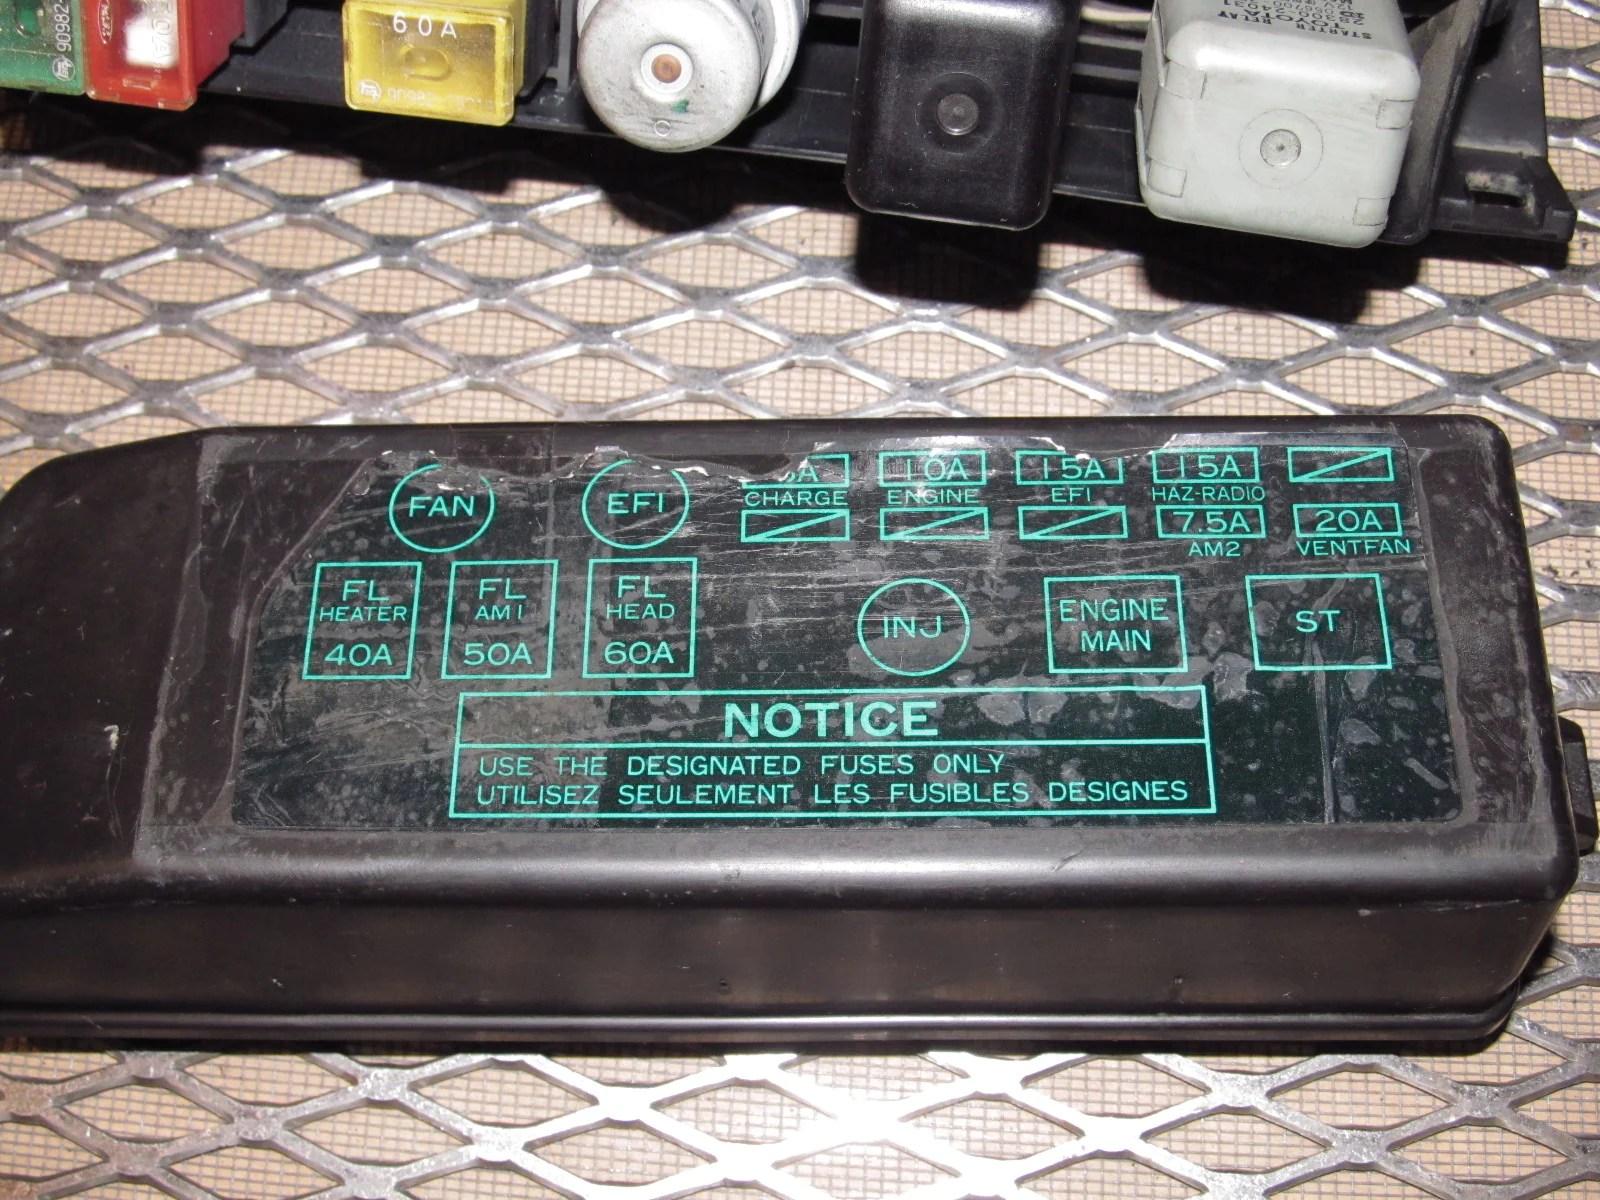 medium resolution of 1987 toyota mr2 fuse box diagram wiring diagram advance 1991 toyota mr2 fuse box diagram aw11 mr2 fuse box diagram